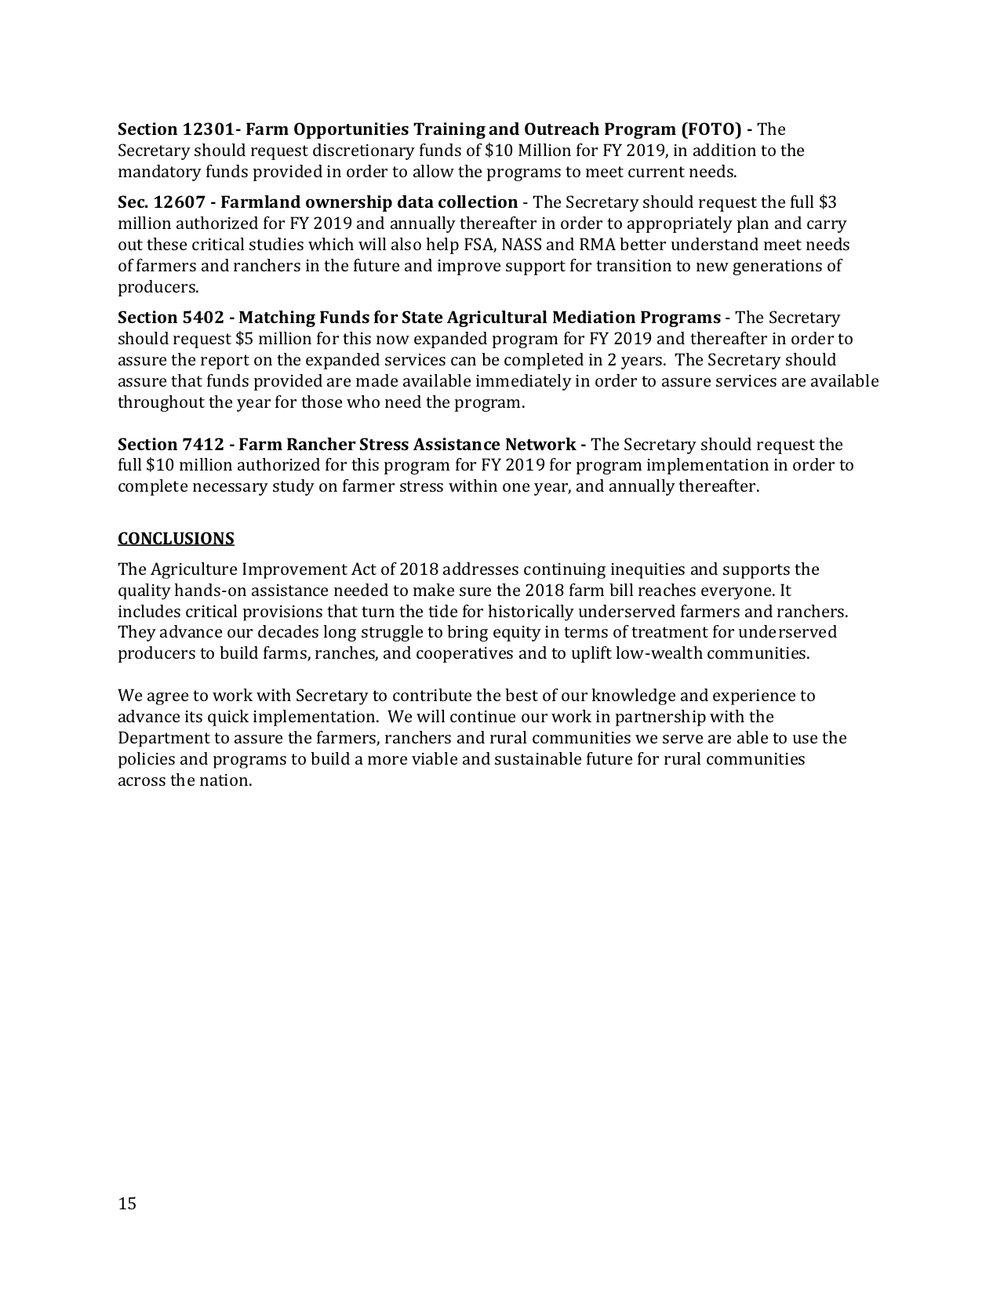 2018 Farm Bill Implementation Recommendations - Rural Co etal final March 1 page 16.jpg